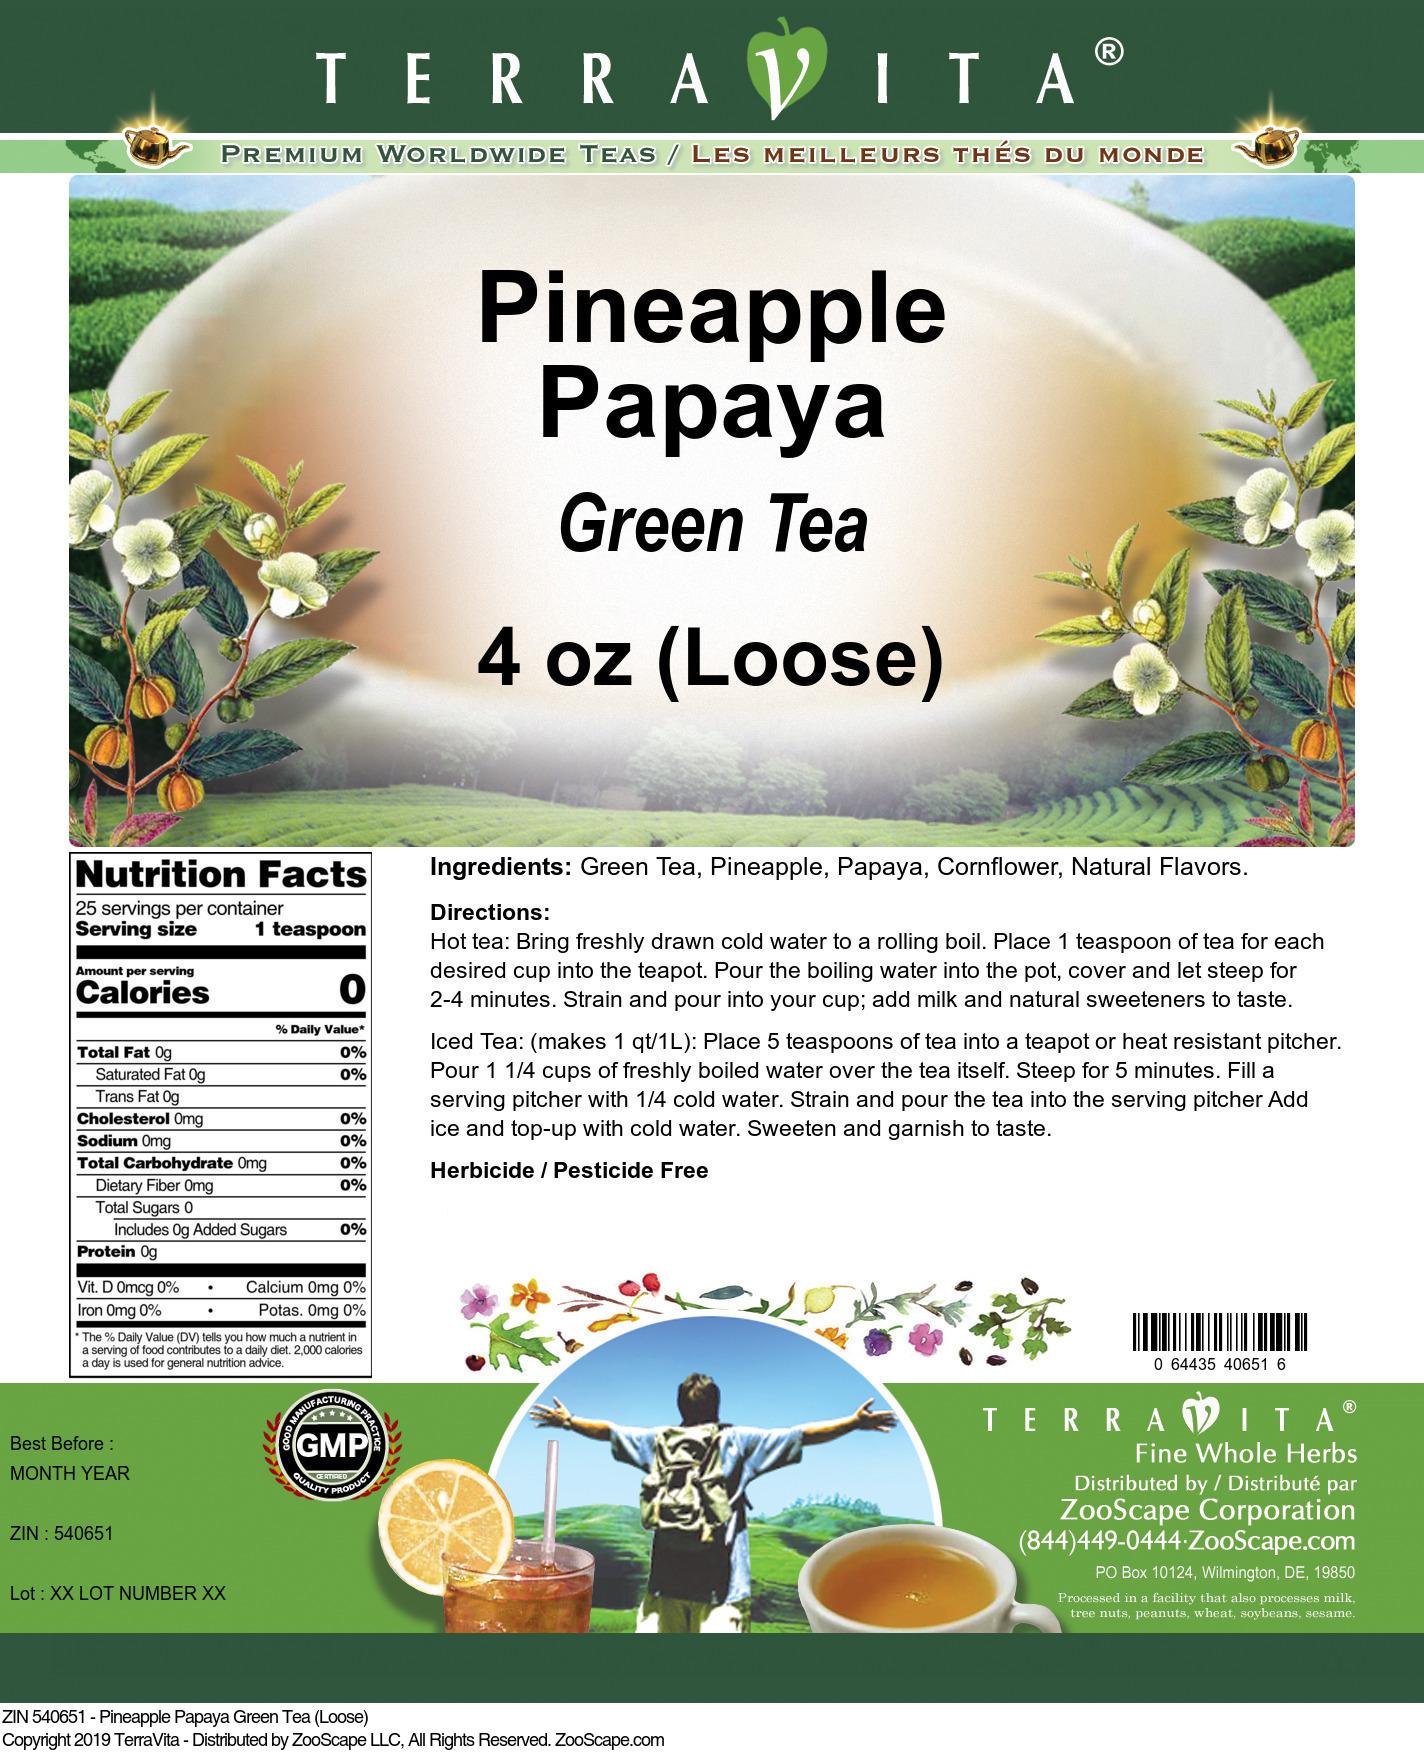 Pineapple Papaya Green Tea